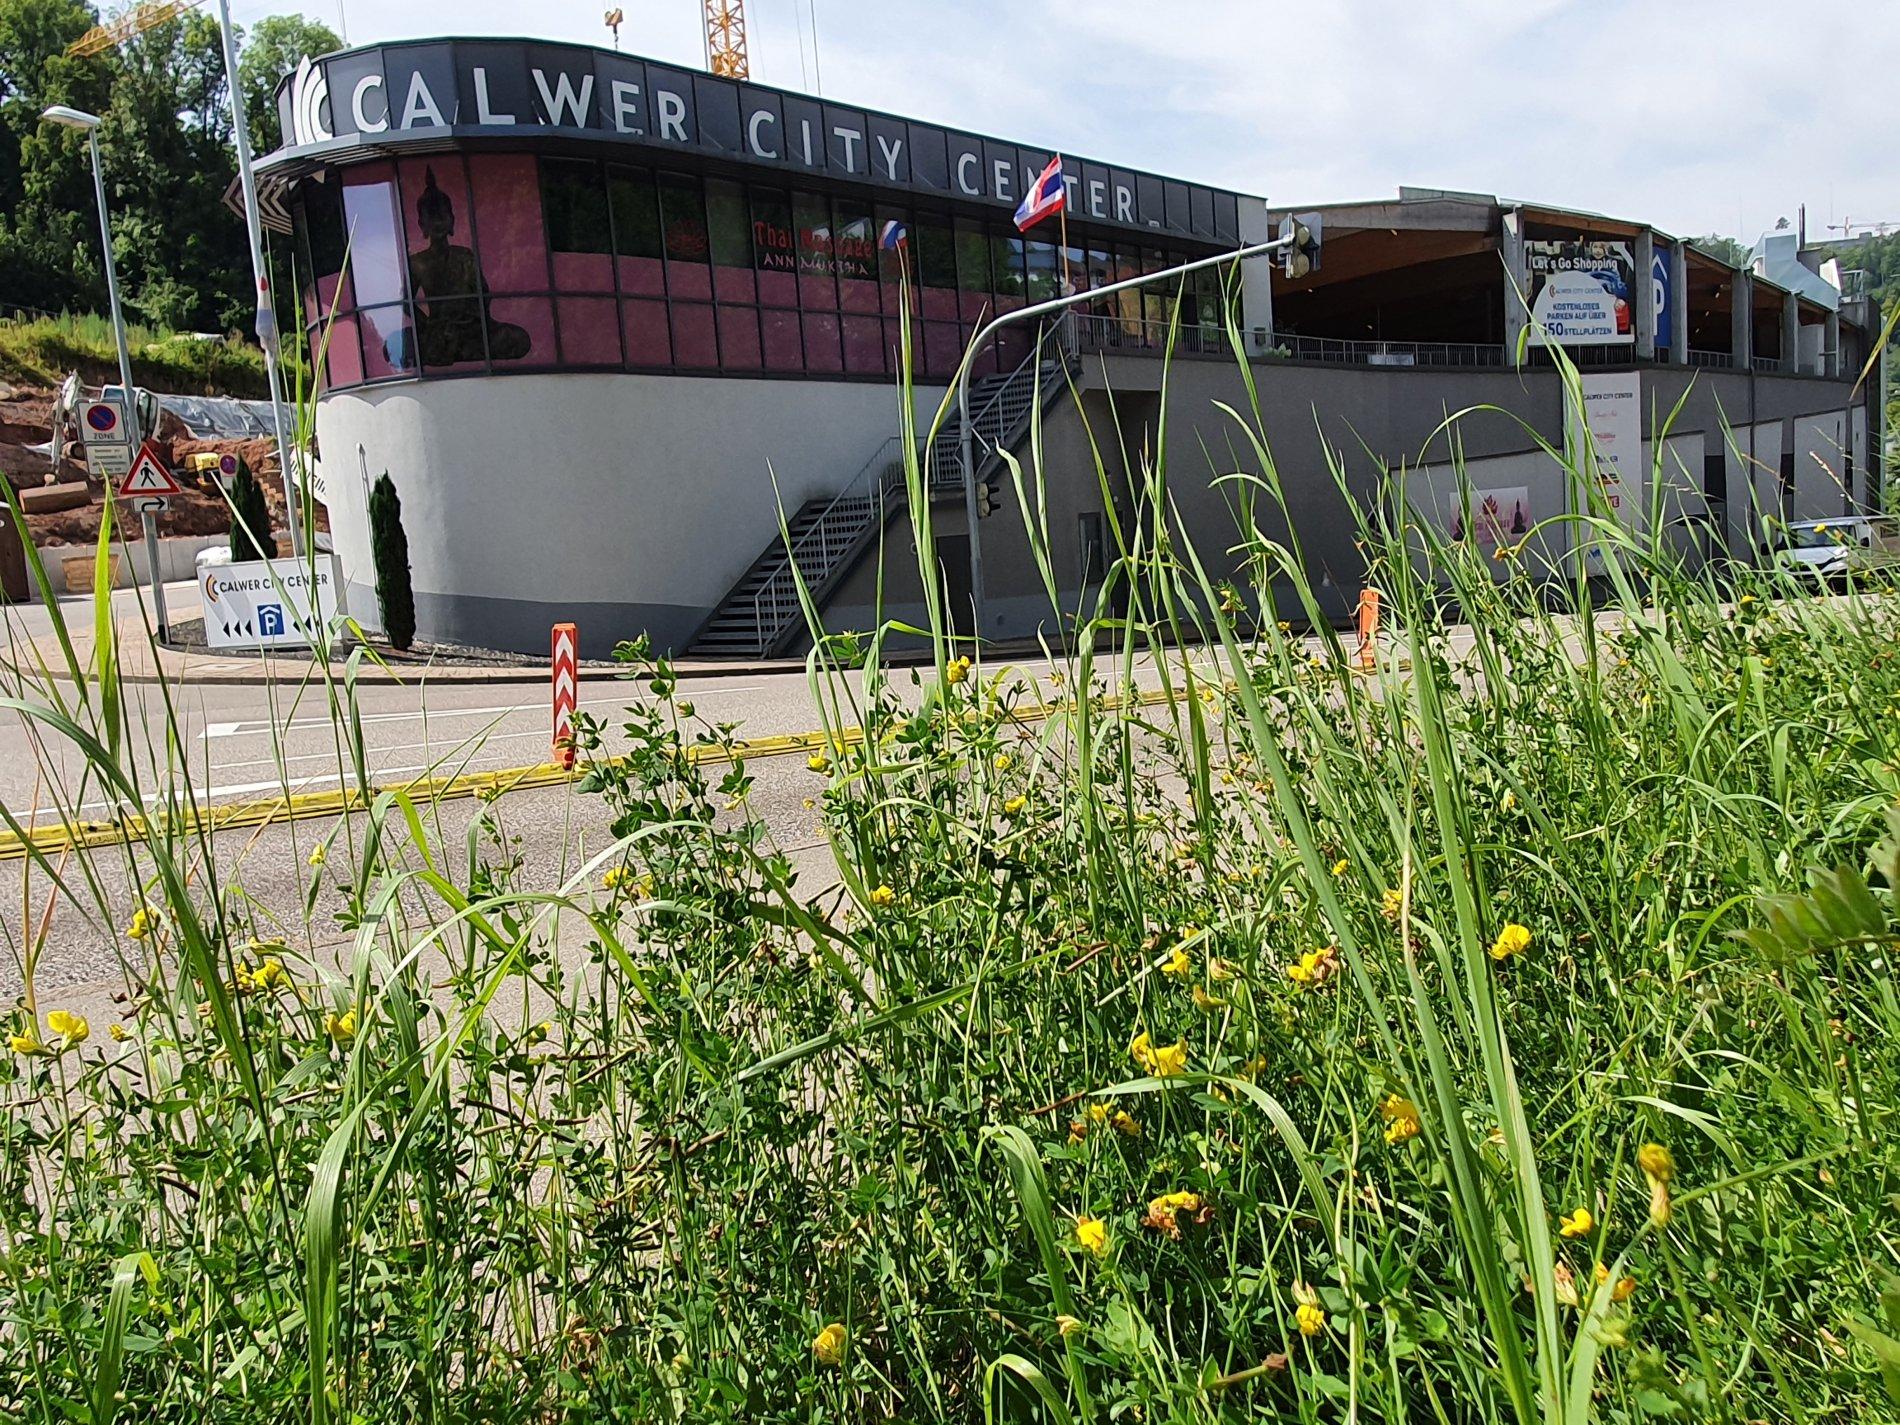 Parkhaus Calwer City Center